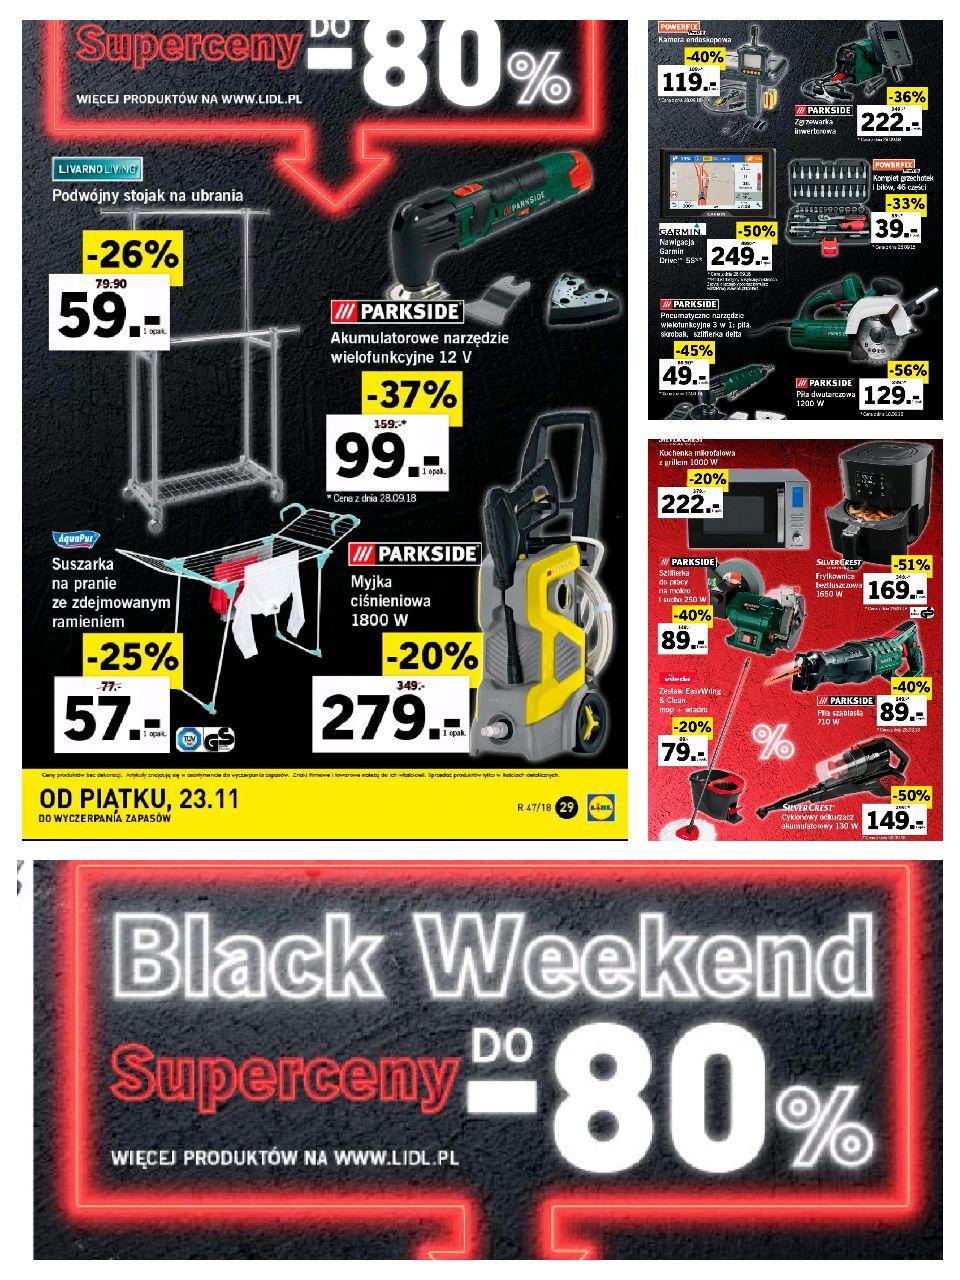 Lidl Black Weekend przecent do - 80%